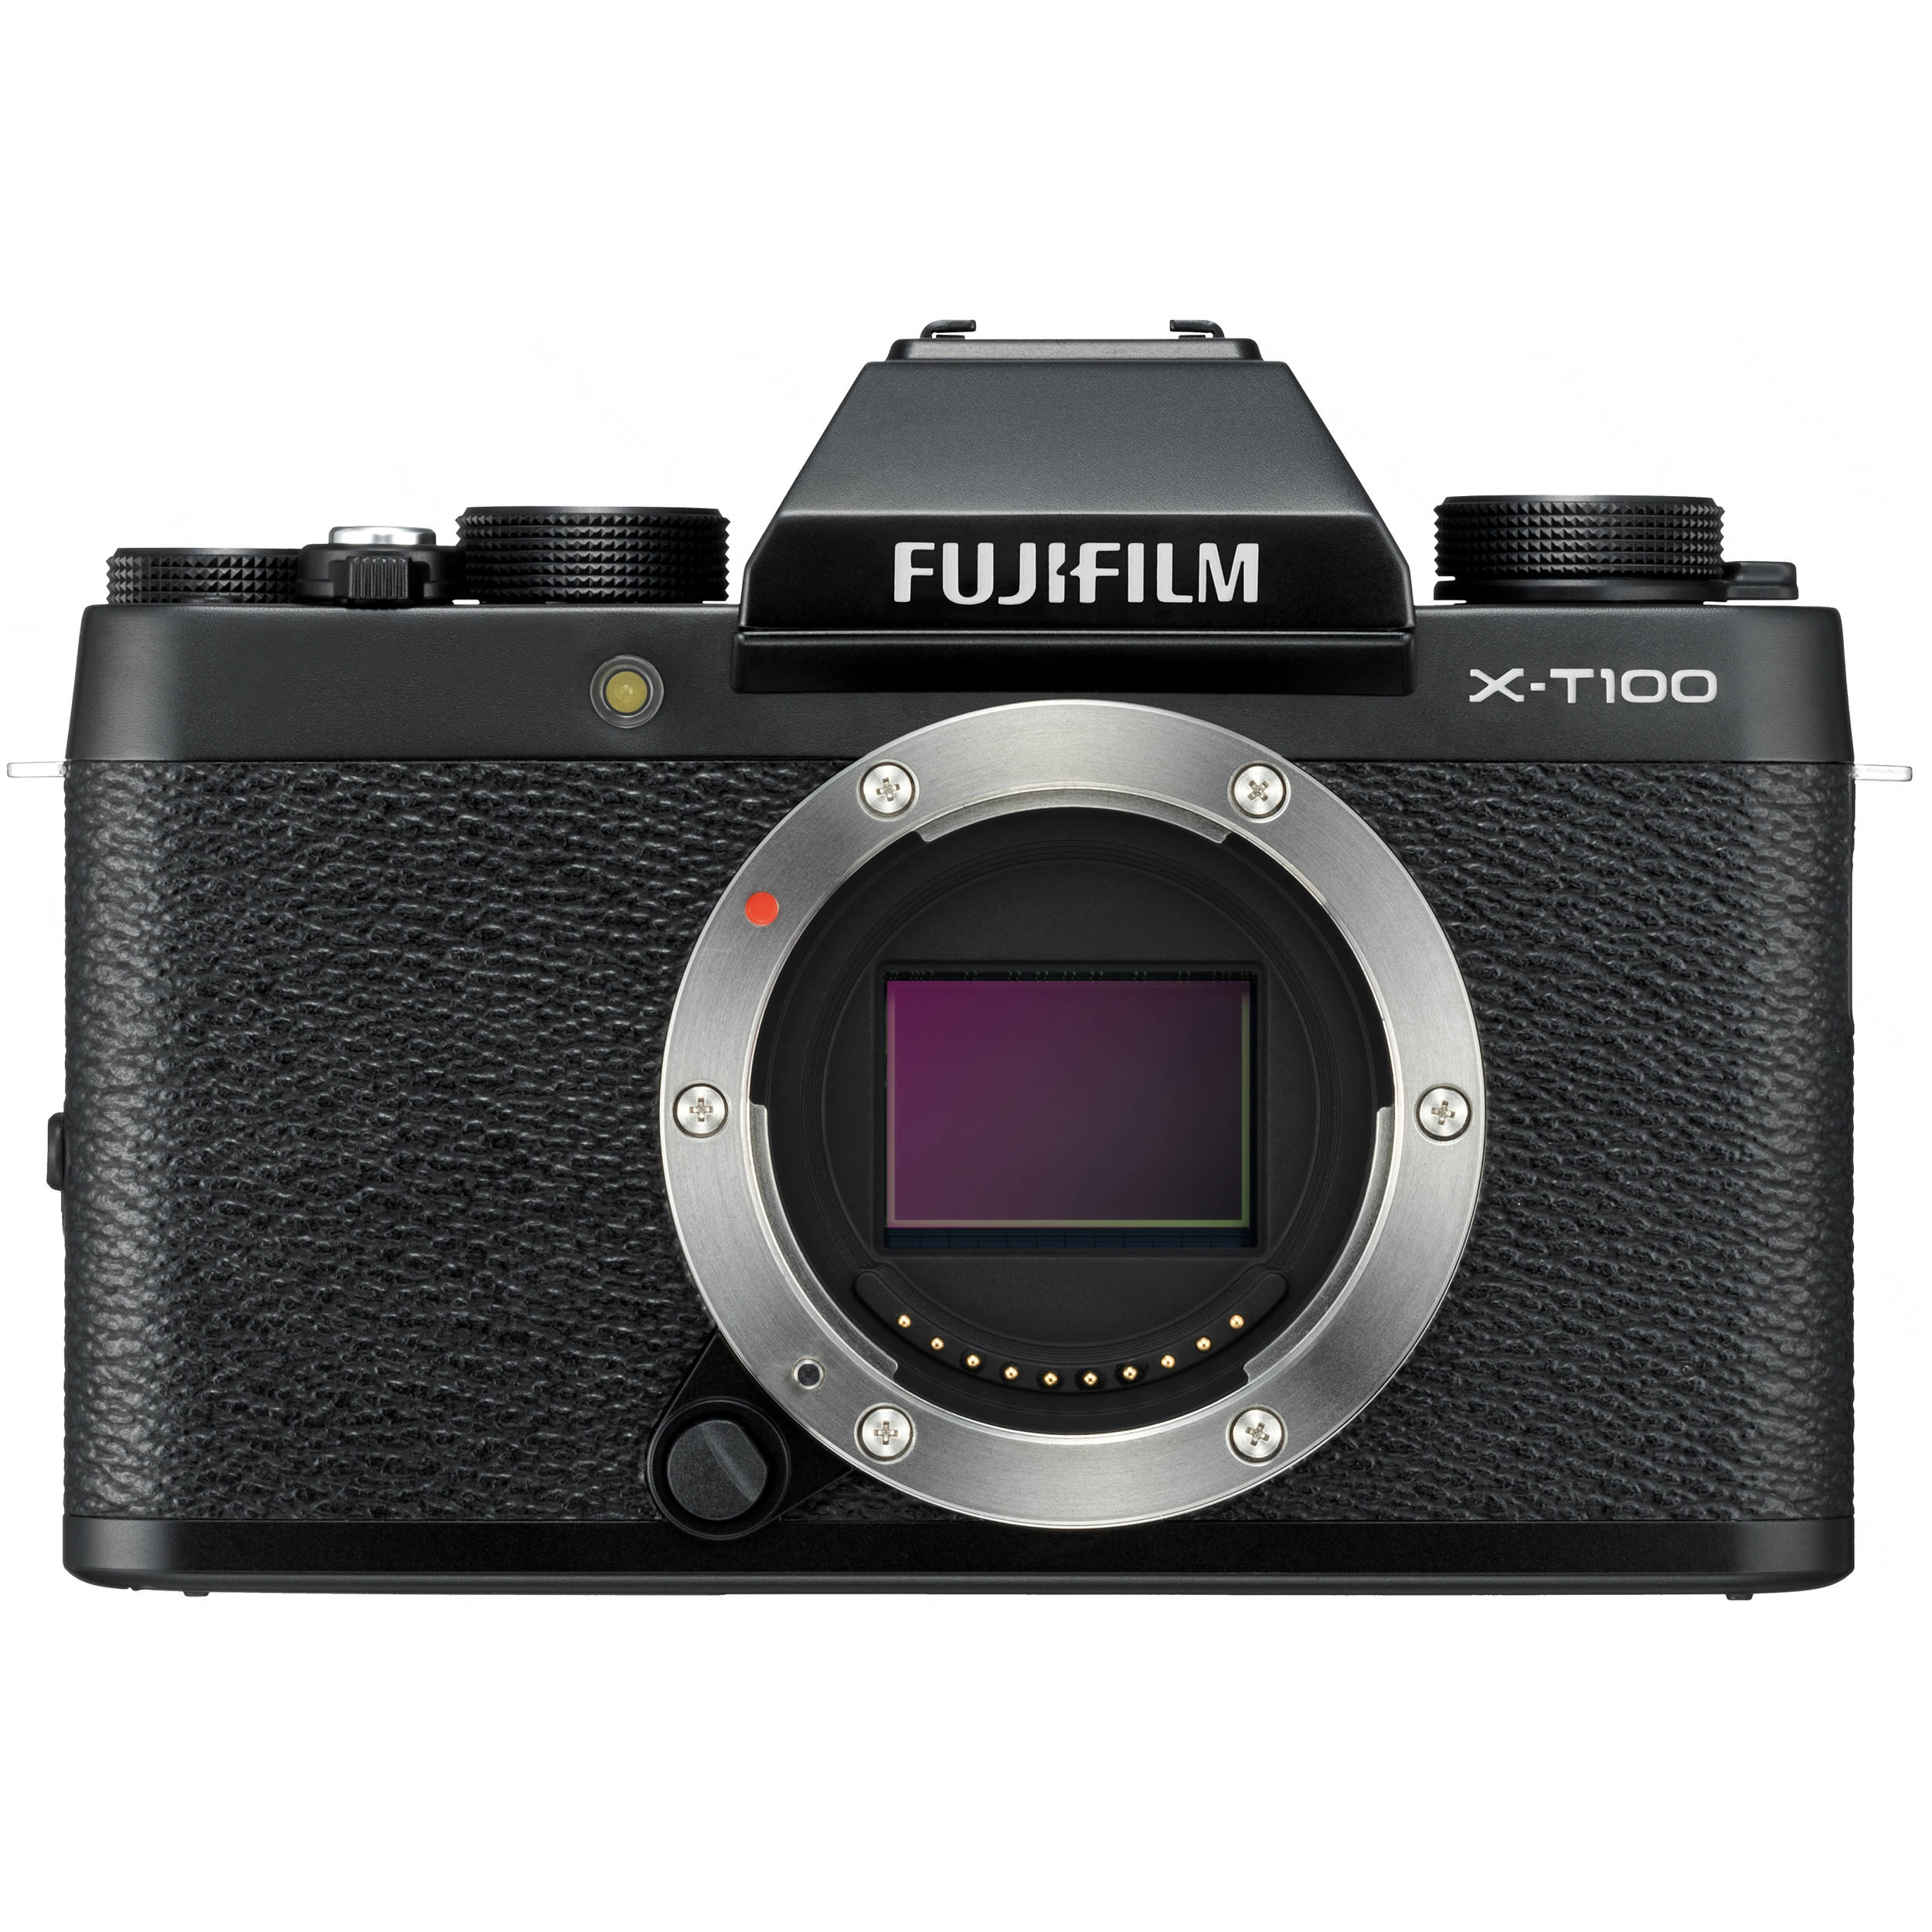 "Fujifilm X-T100 Mirrorless Camera body, 24.2 MP, ISO 51200, Display diagonal 3.0 "", Video recording, Magnification 0.62 x, Viewfind Digitālā kamera"